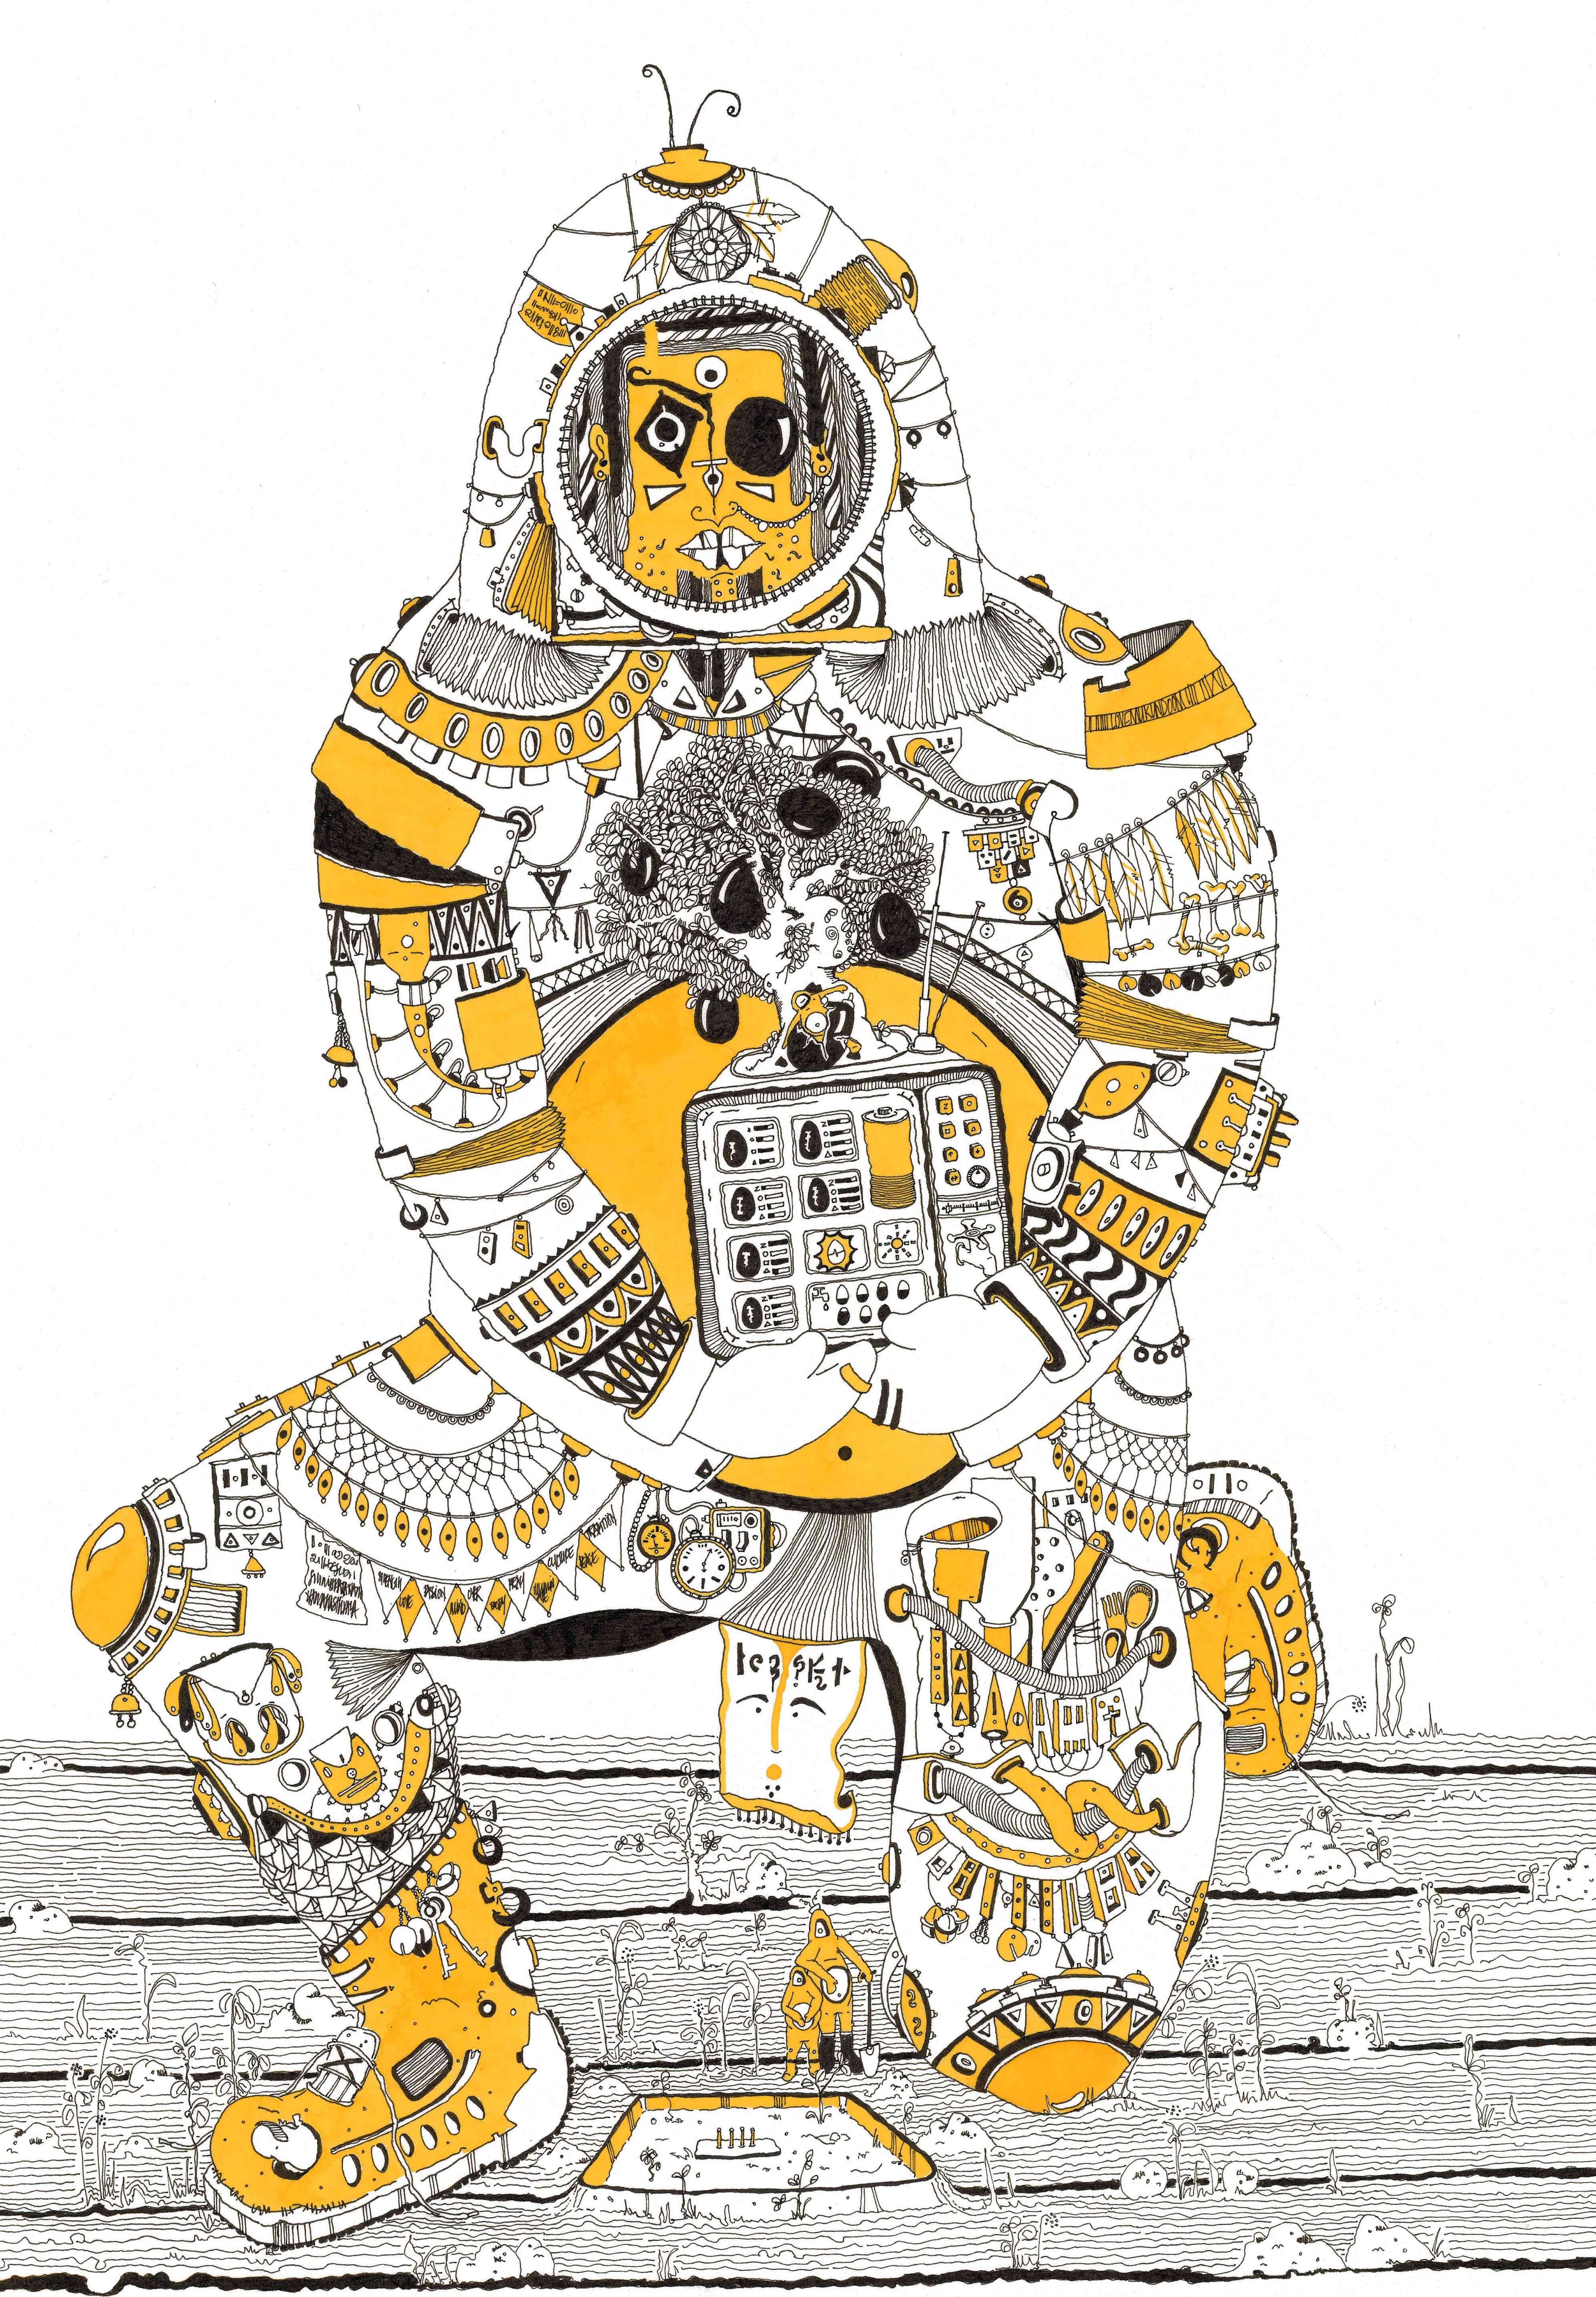 23.The big little yellow man